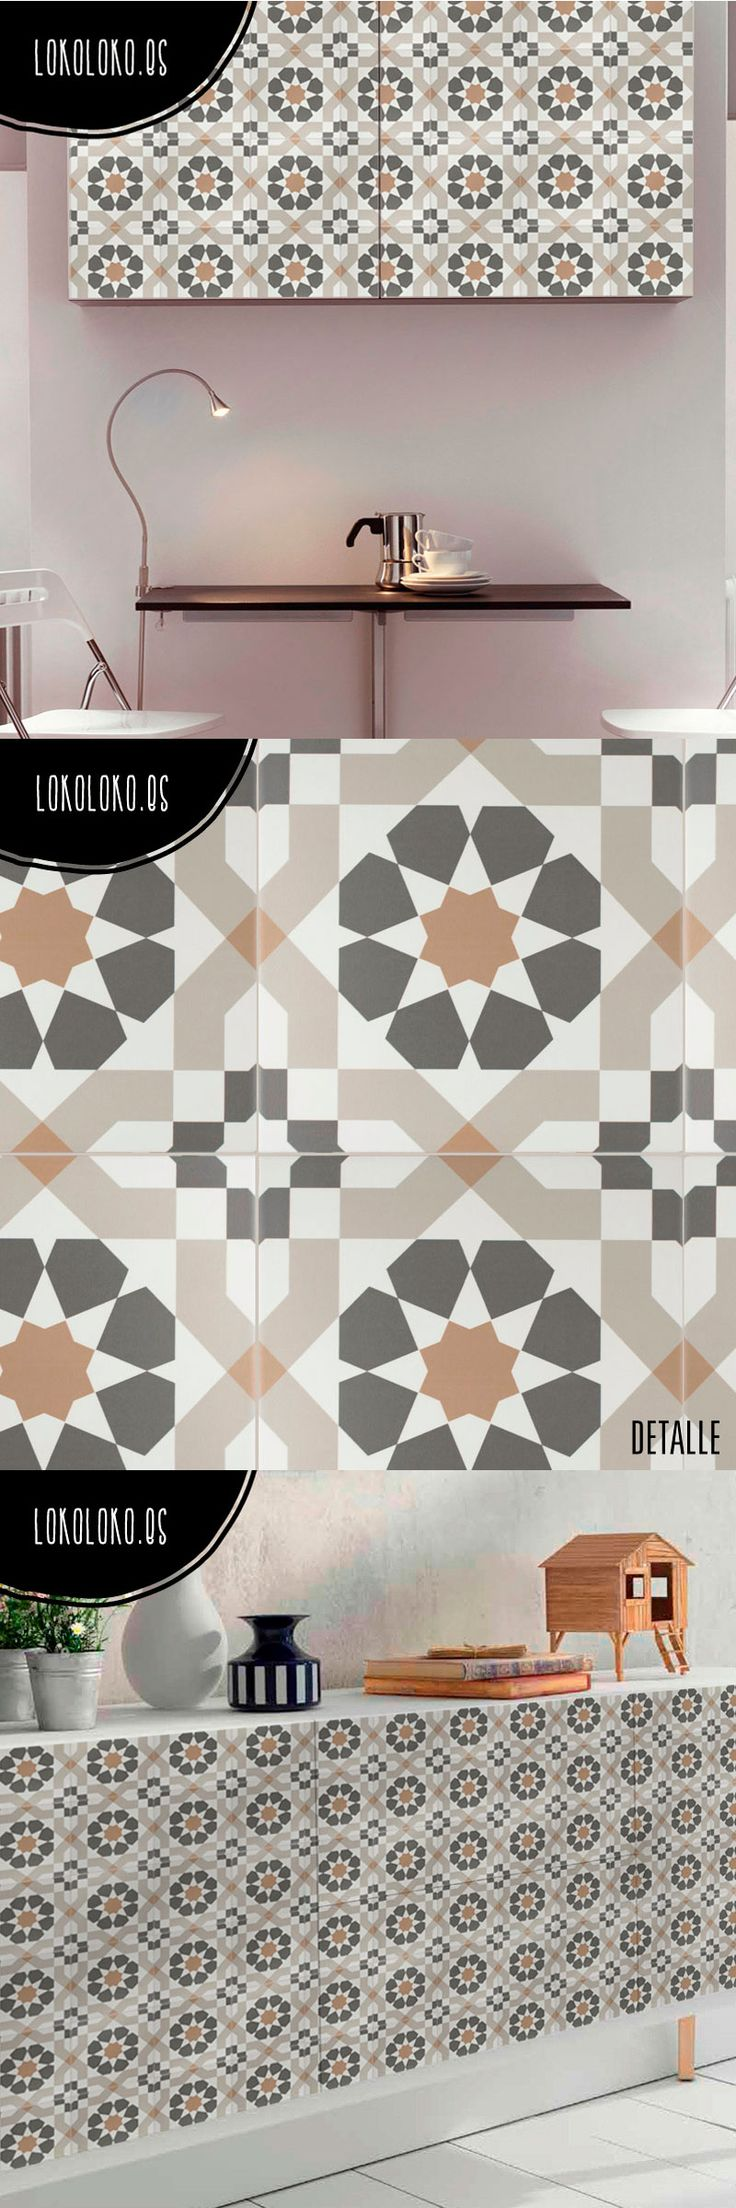 M s de 25 ideas incre bles sobre vinilos para azulejos en for Forrar azulejos cocina